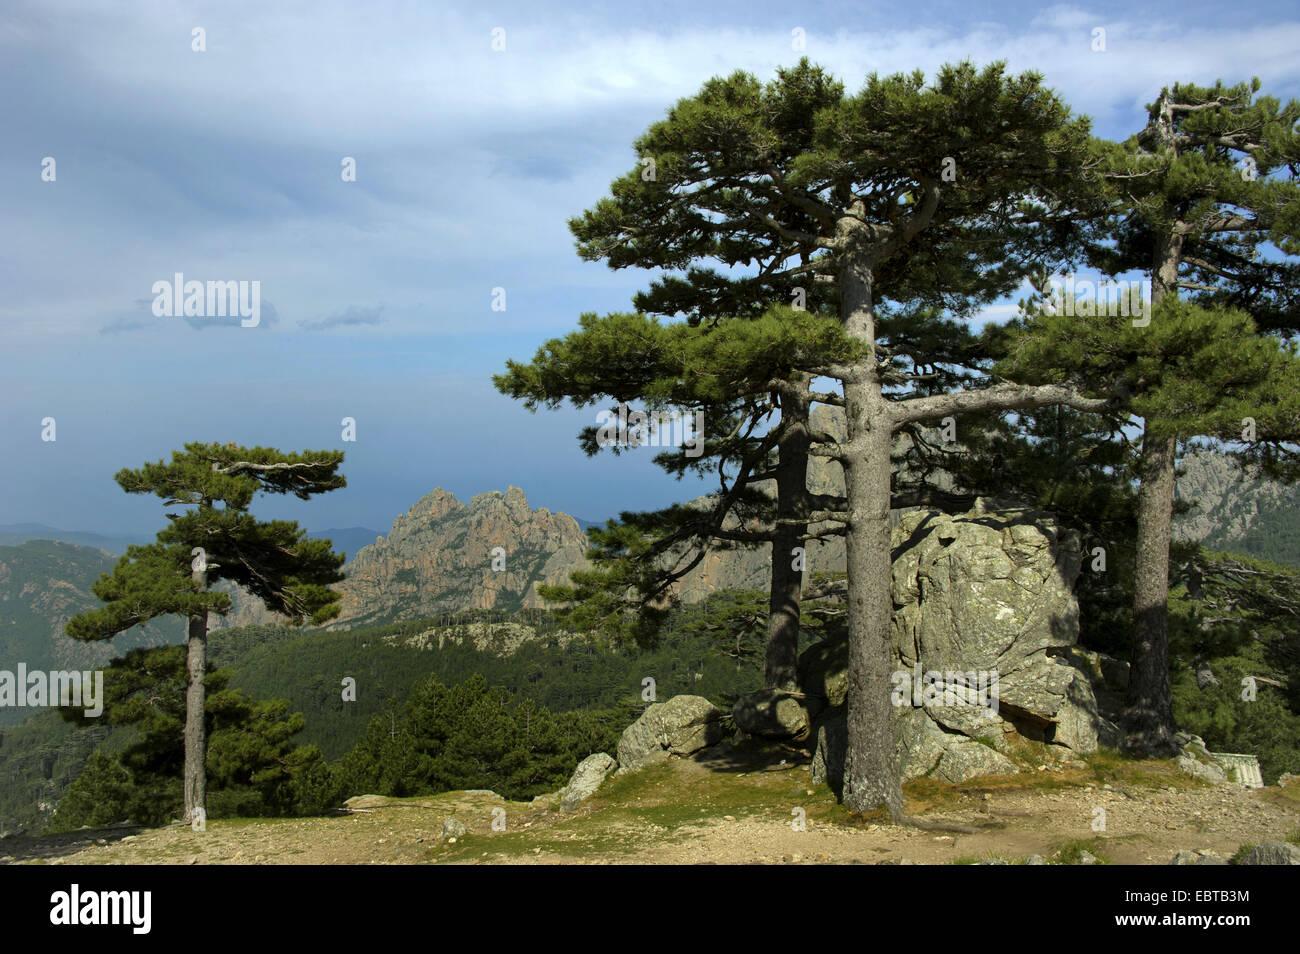 European black pine, Austrian pine, Black Pine, Corsican Pine (Pinus nigra), at Col de Bavella, France, Corsica, Stock Photo